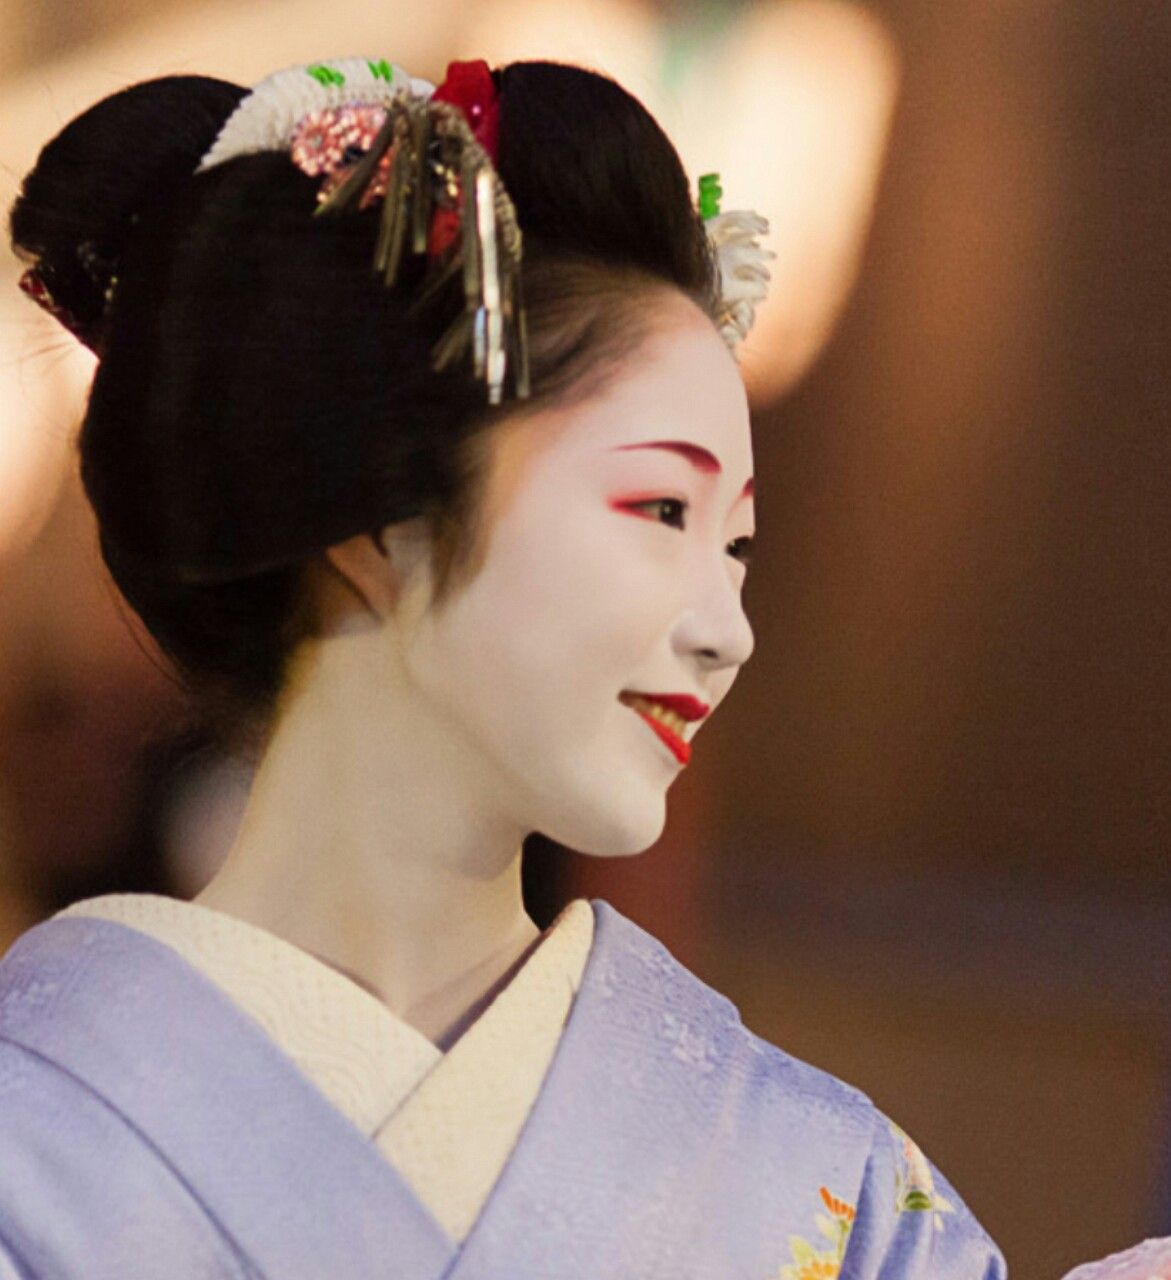 Maiko Her Name Is Toshikana Japan Kyoto Geisha Maiko